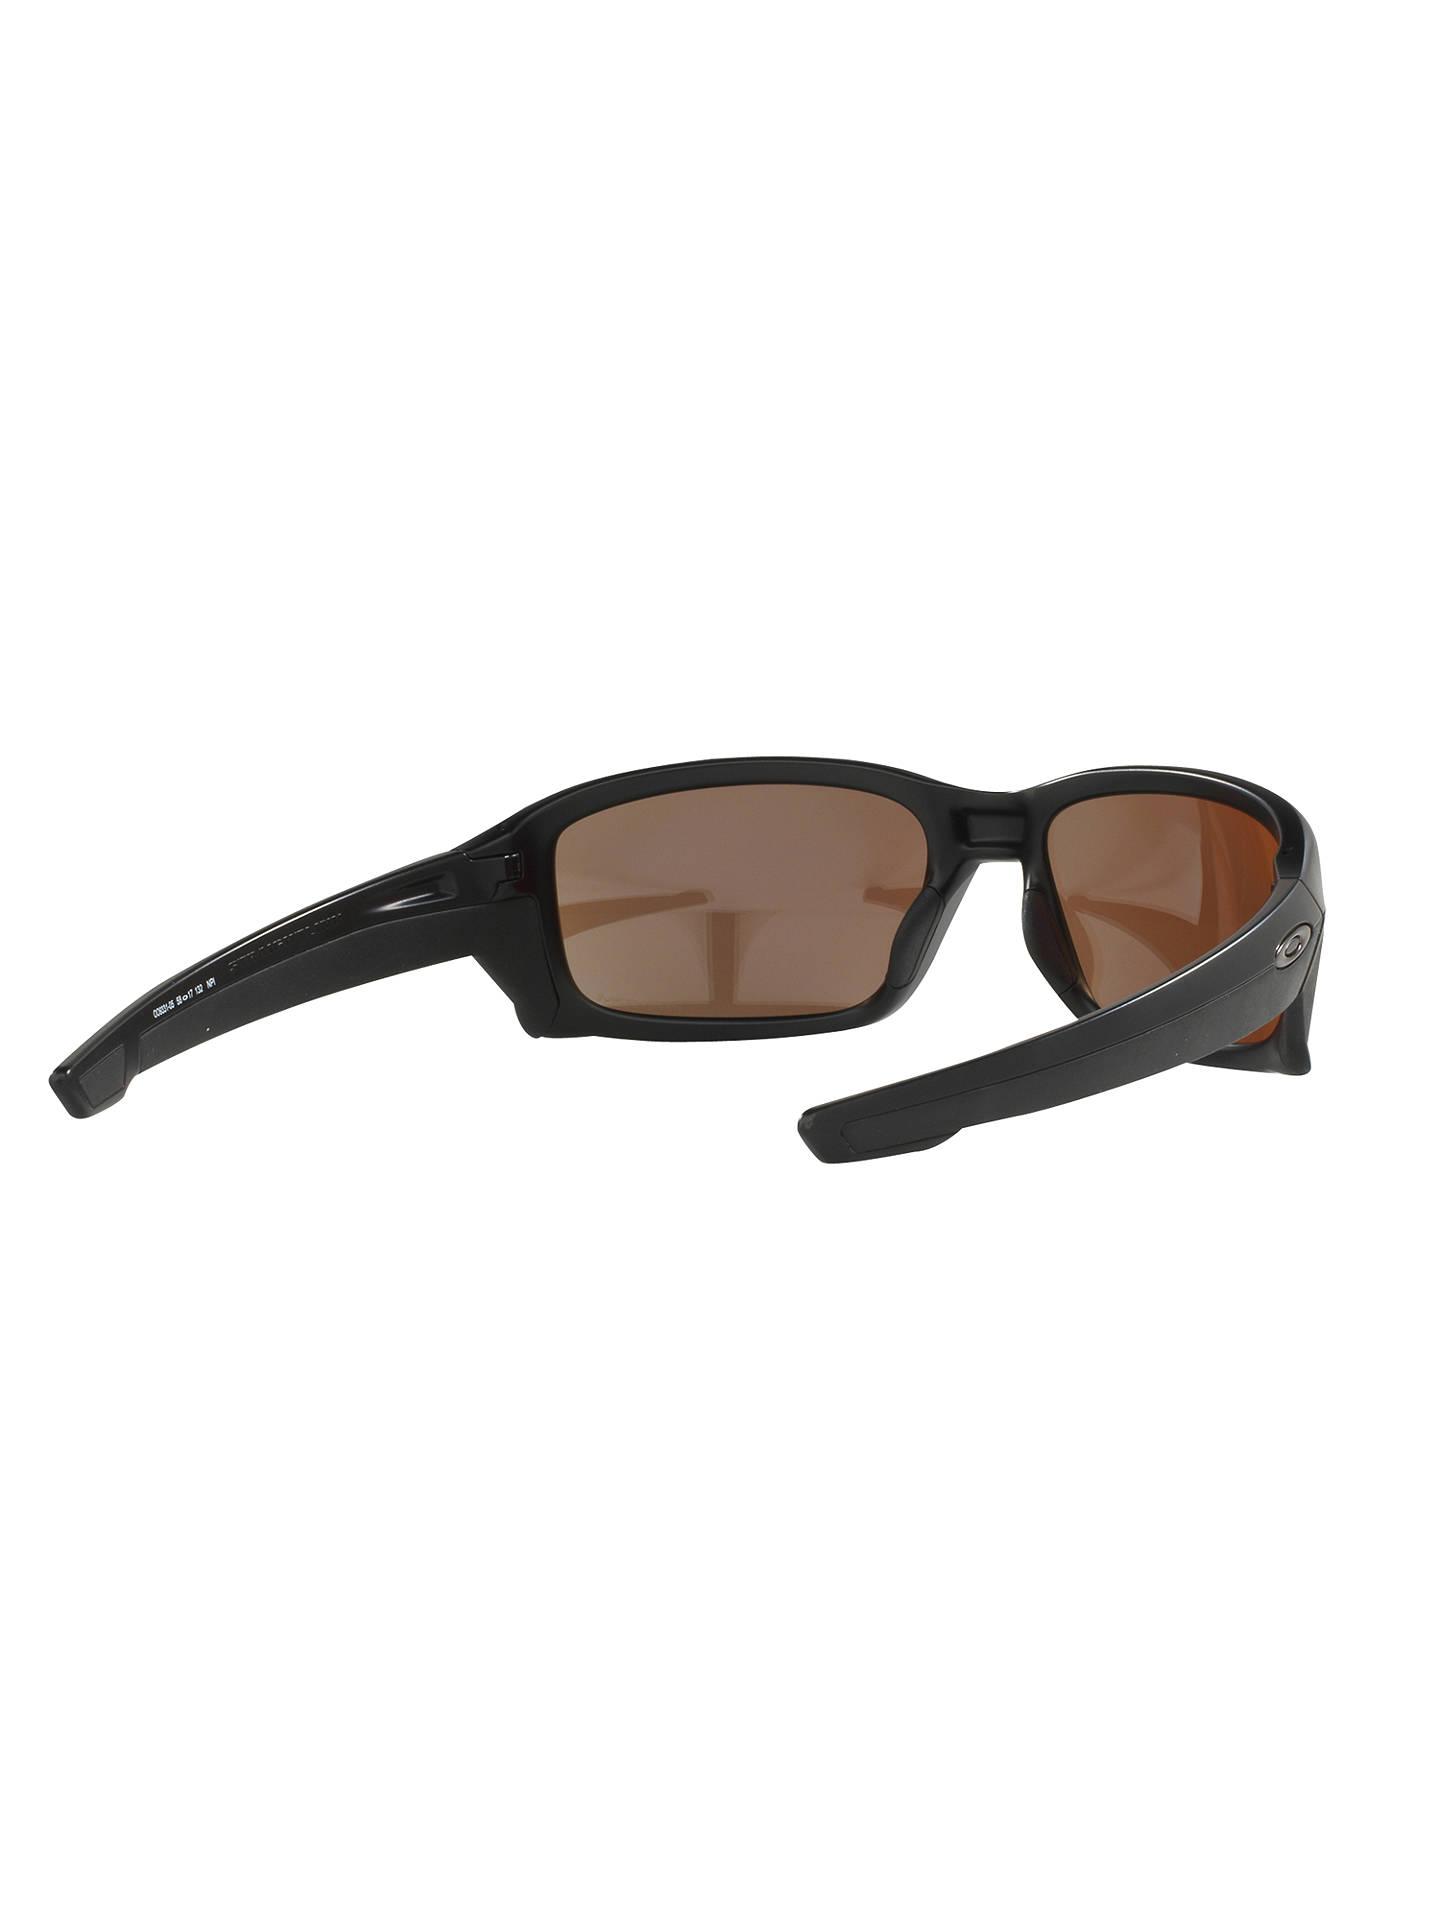 406d9d3cc6 ... BuyOakley OO9331 Straightlink Prizm Daily Polarised Rectangular  Sunglasses